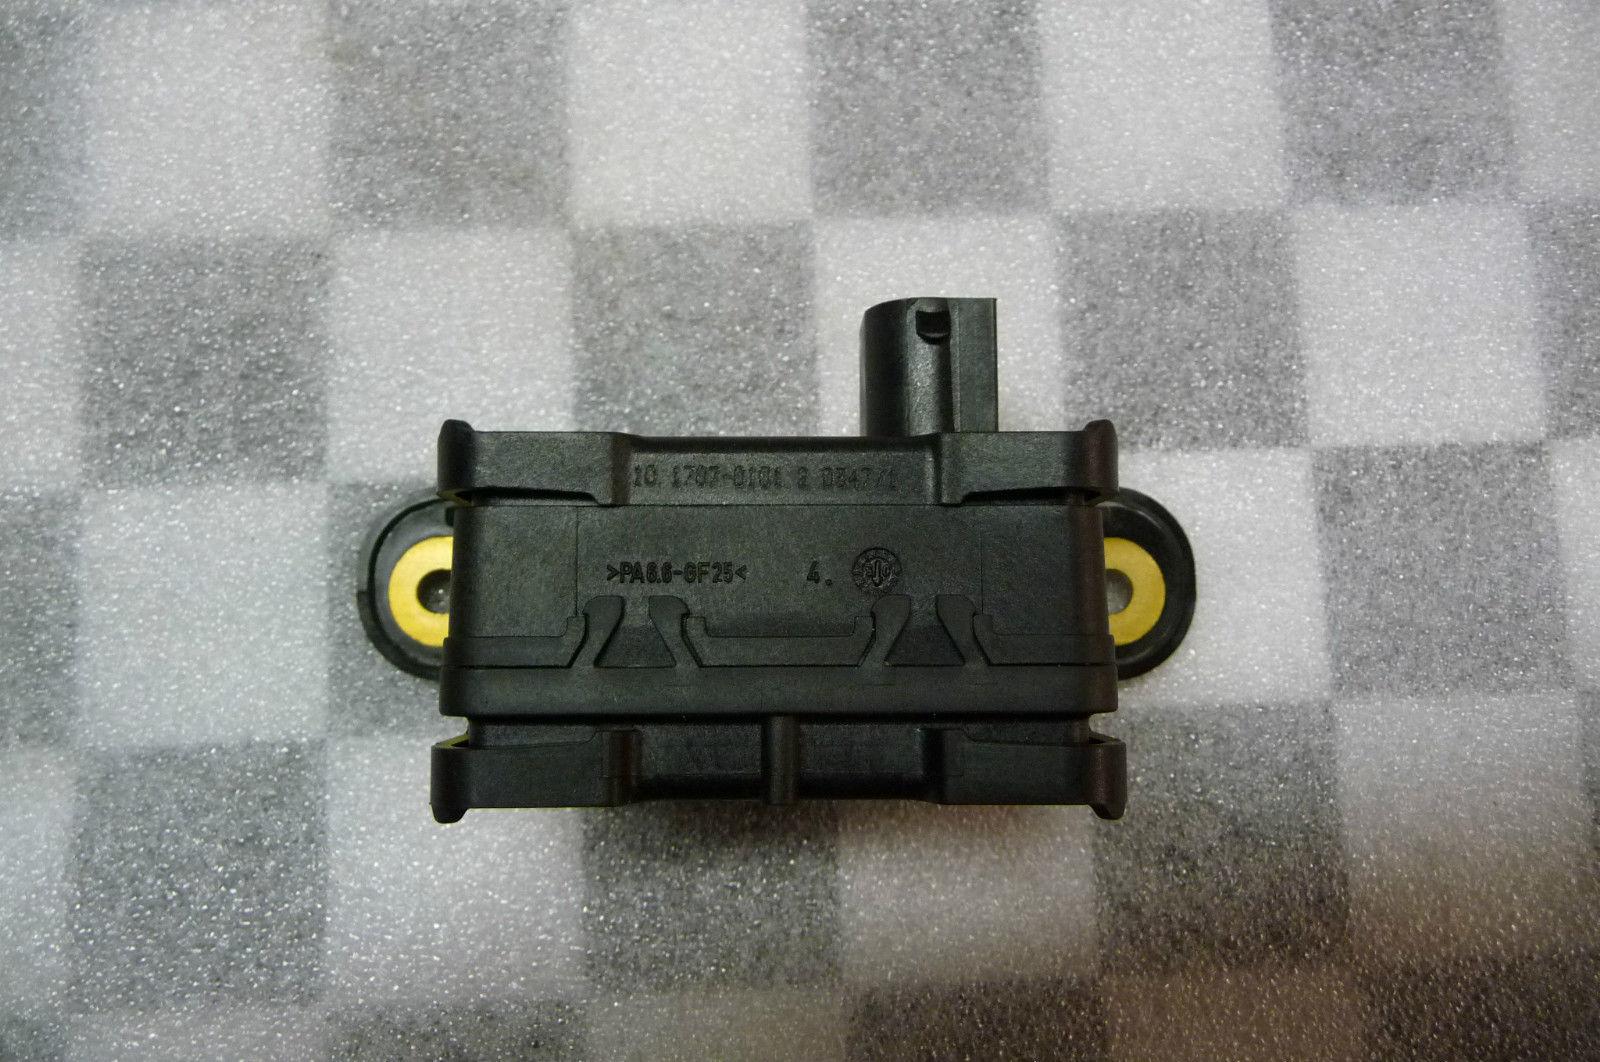 2006 2007 2008 2009 2010 BMW E90 E91 E92 E93 E63 E64 325i 328i M5 M6 Brakes Hydro Unit Control System Speed Sensor 34526762769 OEM